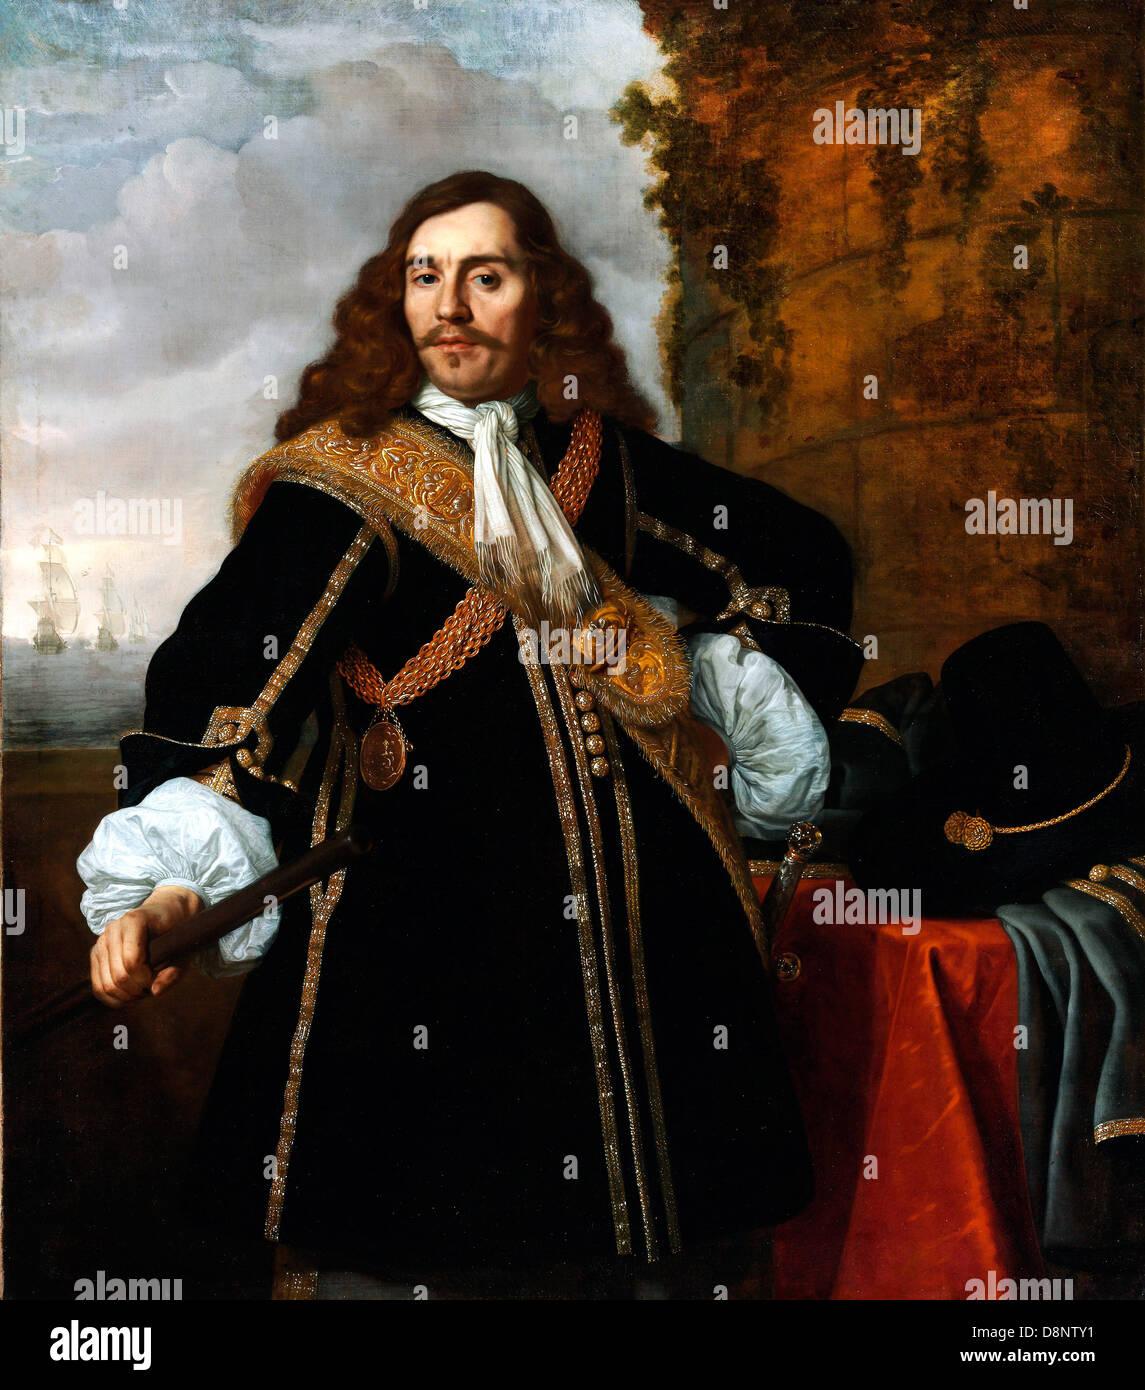 Bartholomeus van der Helst, Portrait of Captain Gideon de Wildt 1657 Oil on canvas. Museum of Fine Arts, Budapest. - Stock Image